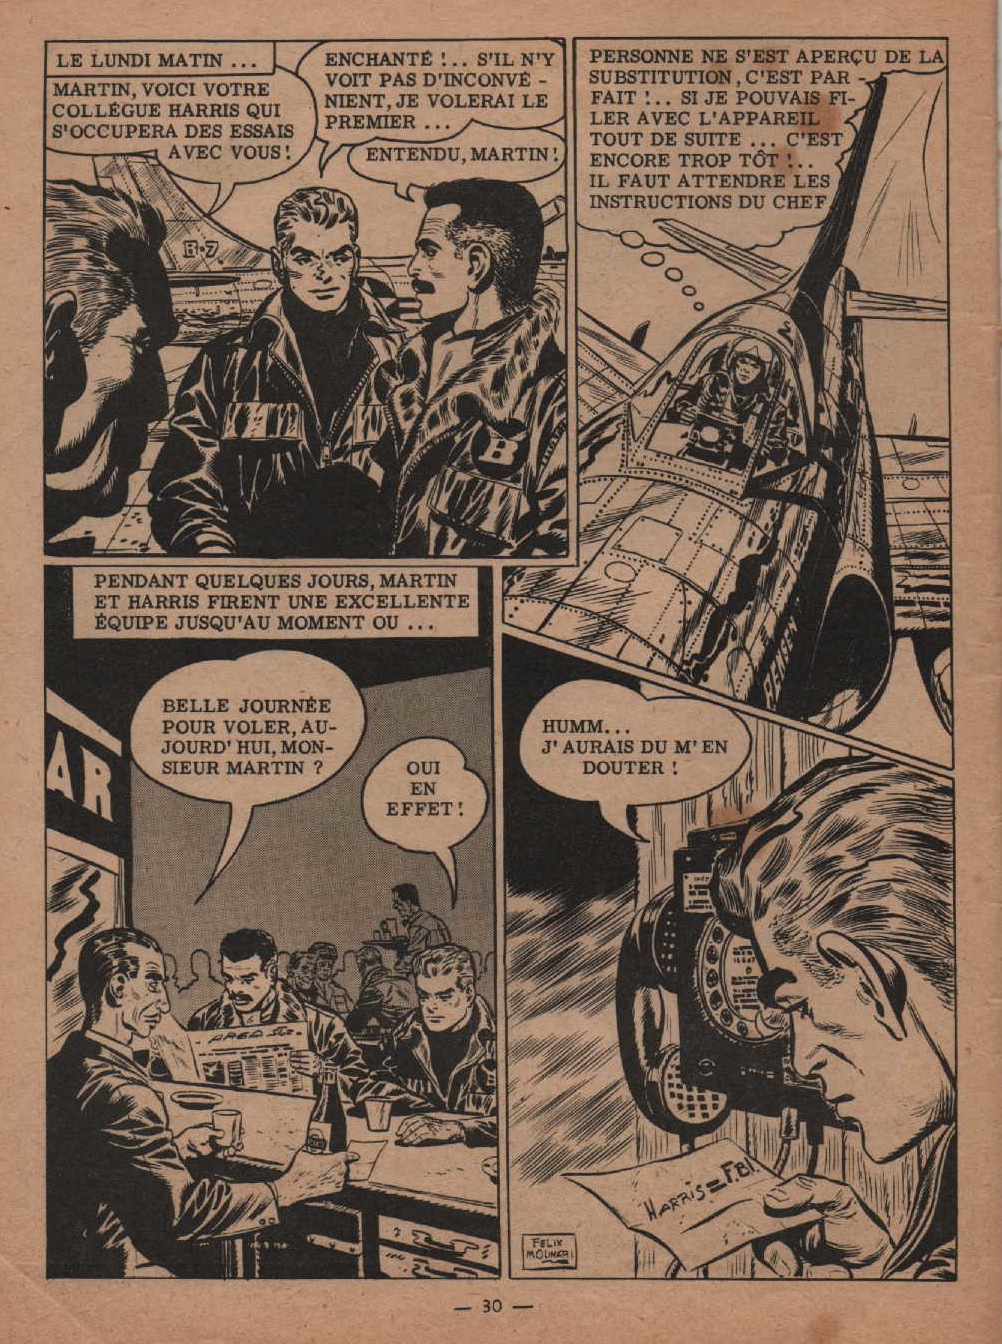 « Kidnapping en plein ciel » Garry n° 133 (06/1959).